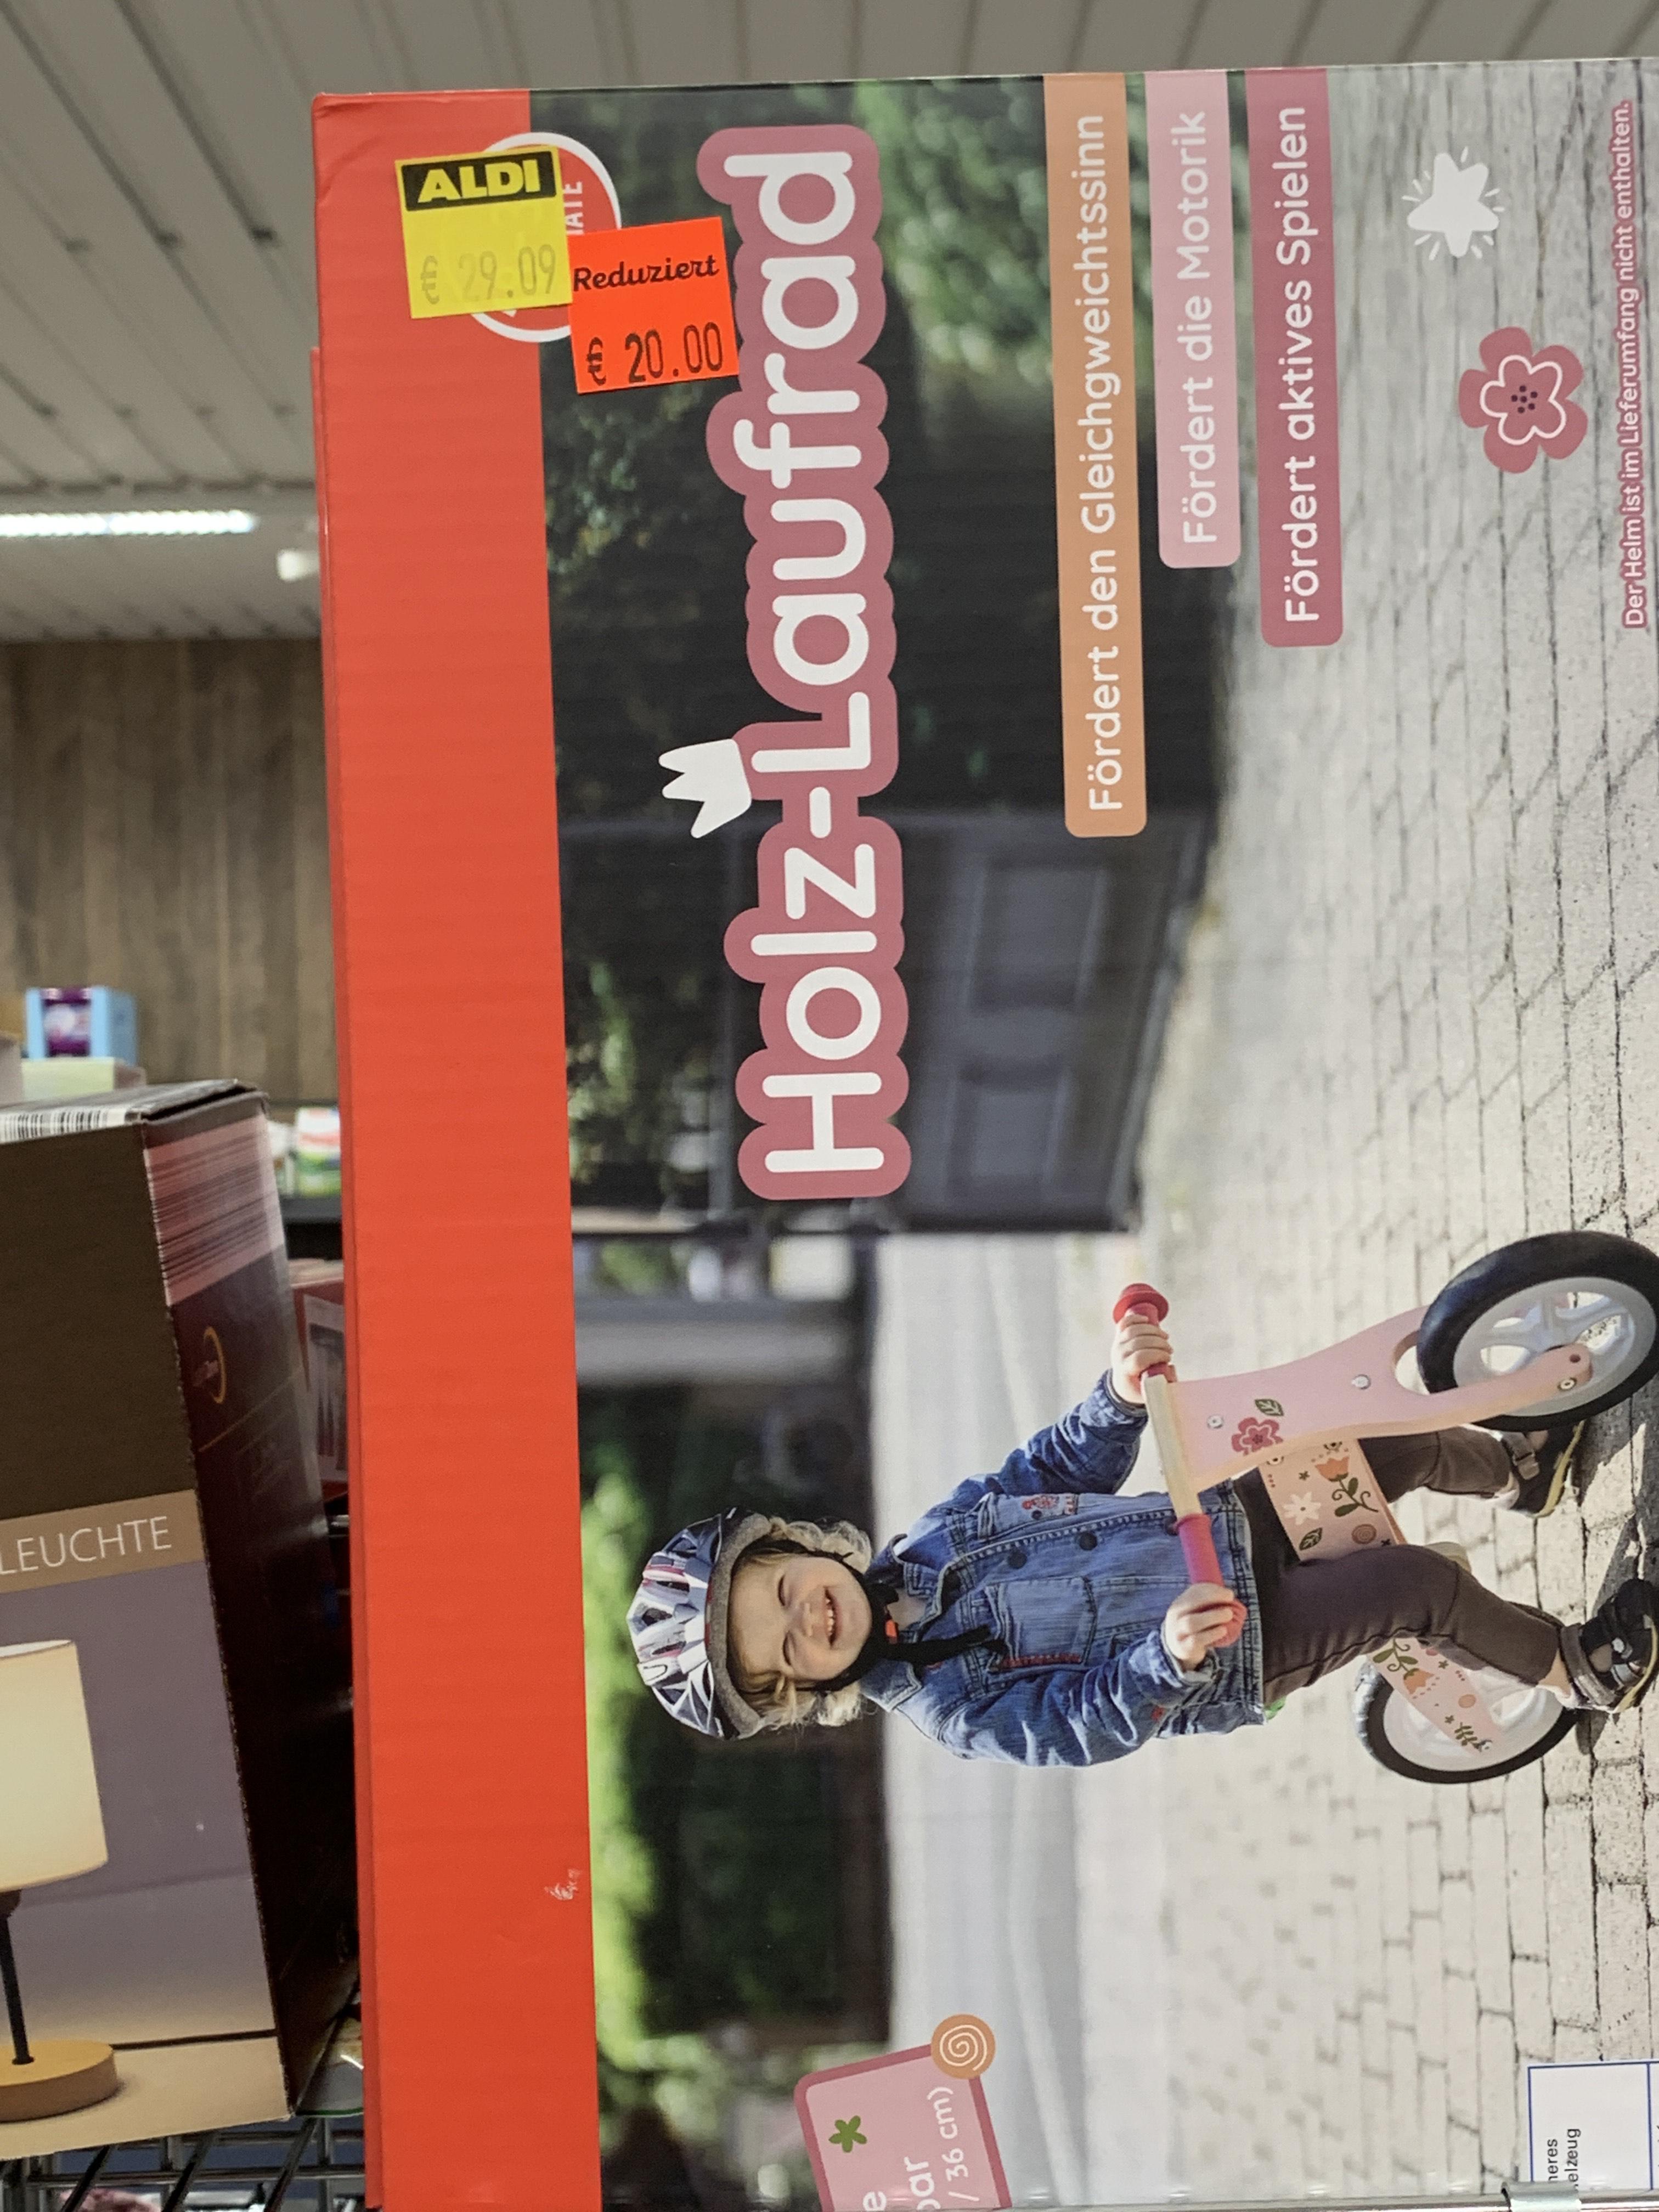 [Lokal] Aldi Nord Wuppertal Elberfeld Holz Roller / Laufrad für Kinder